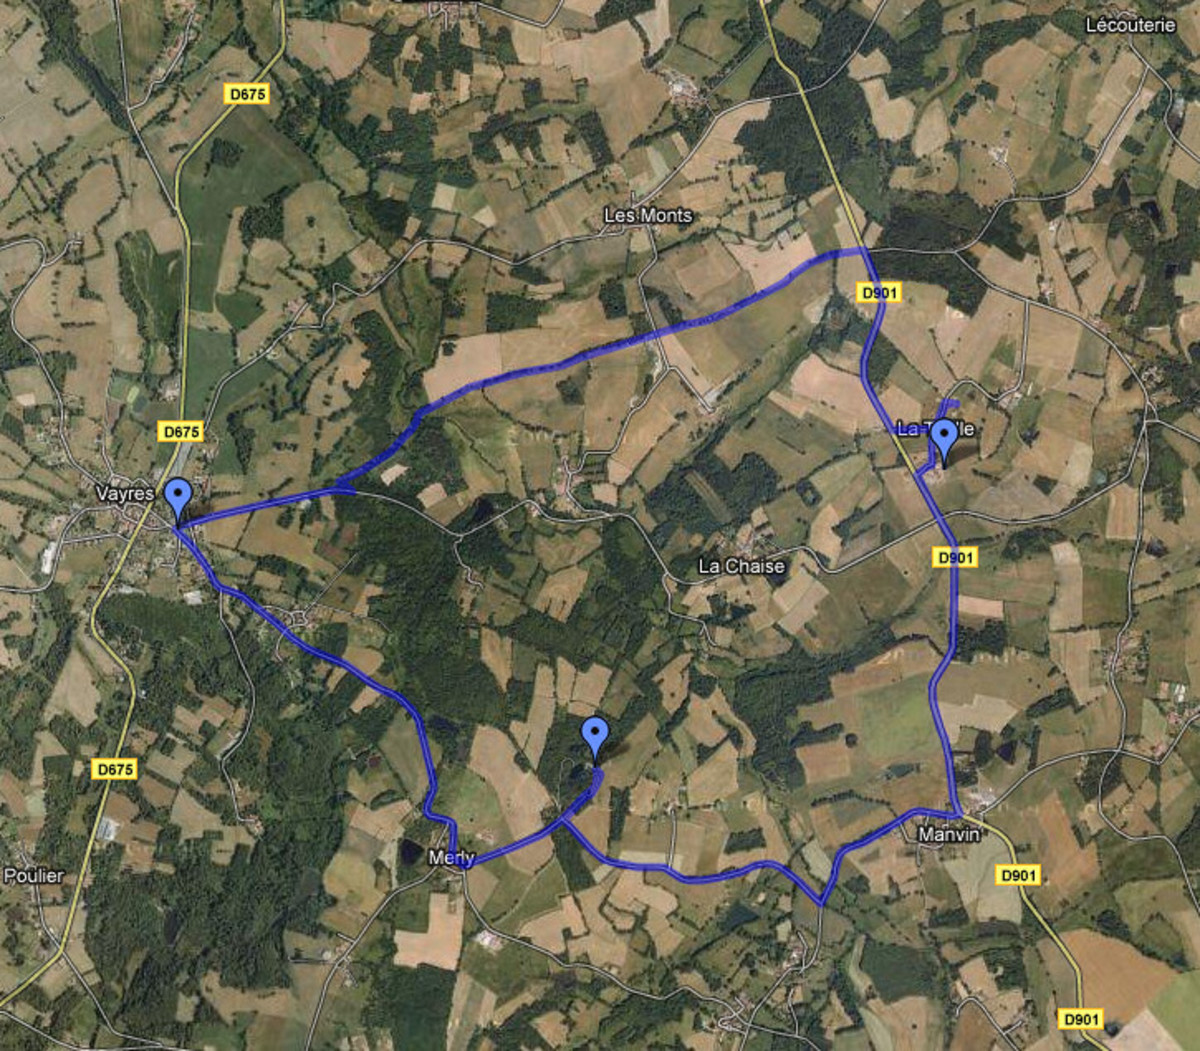 This is one of my Walks around Videix maps